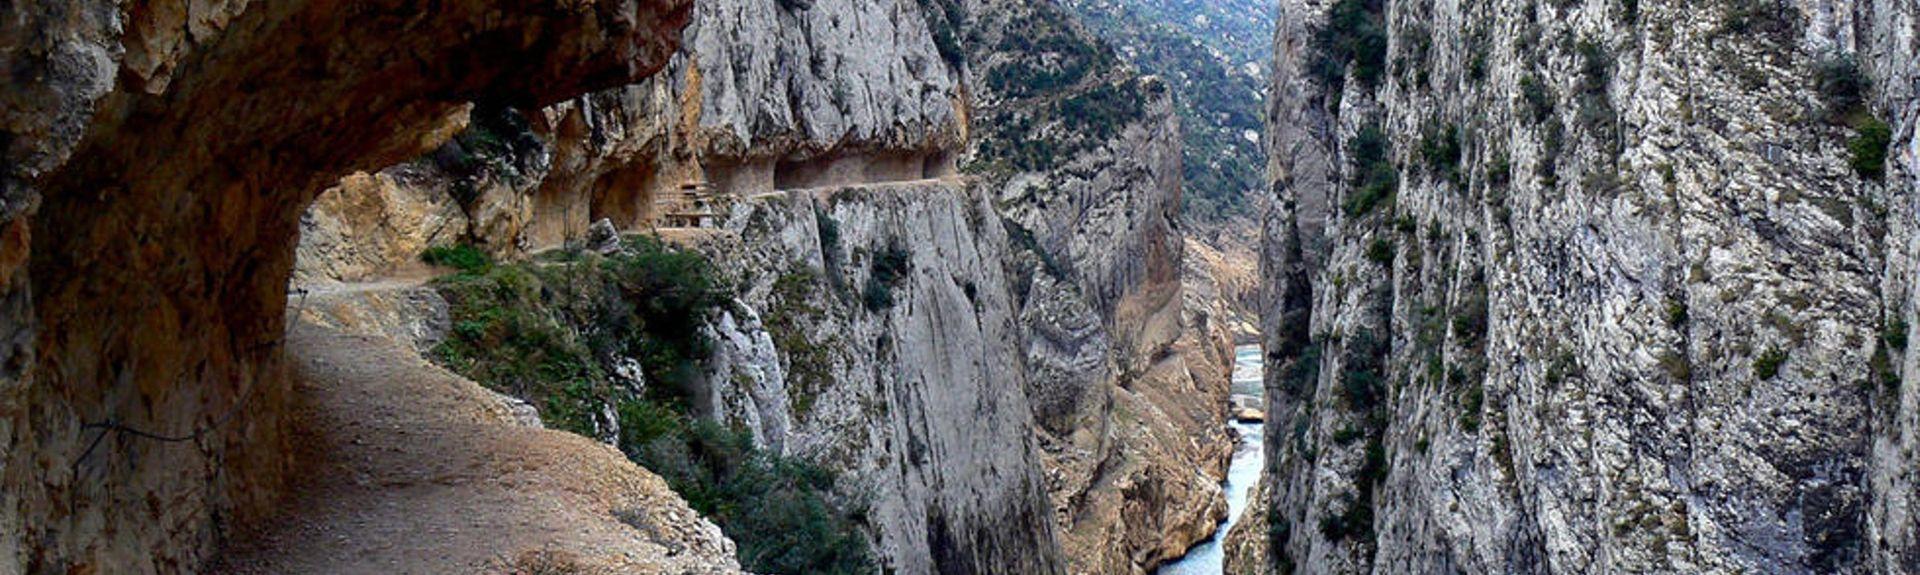 Benabarre, Huesca, Spain